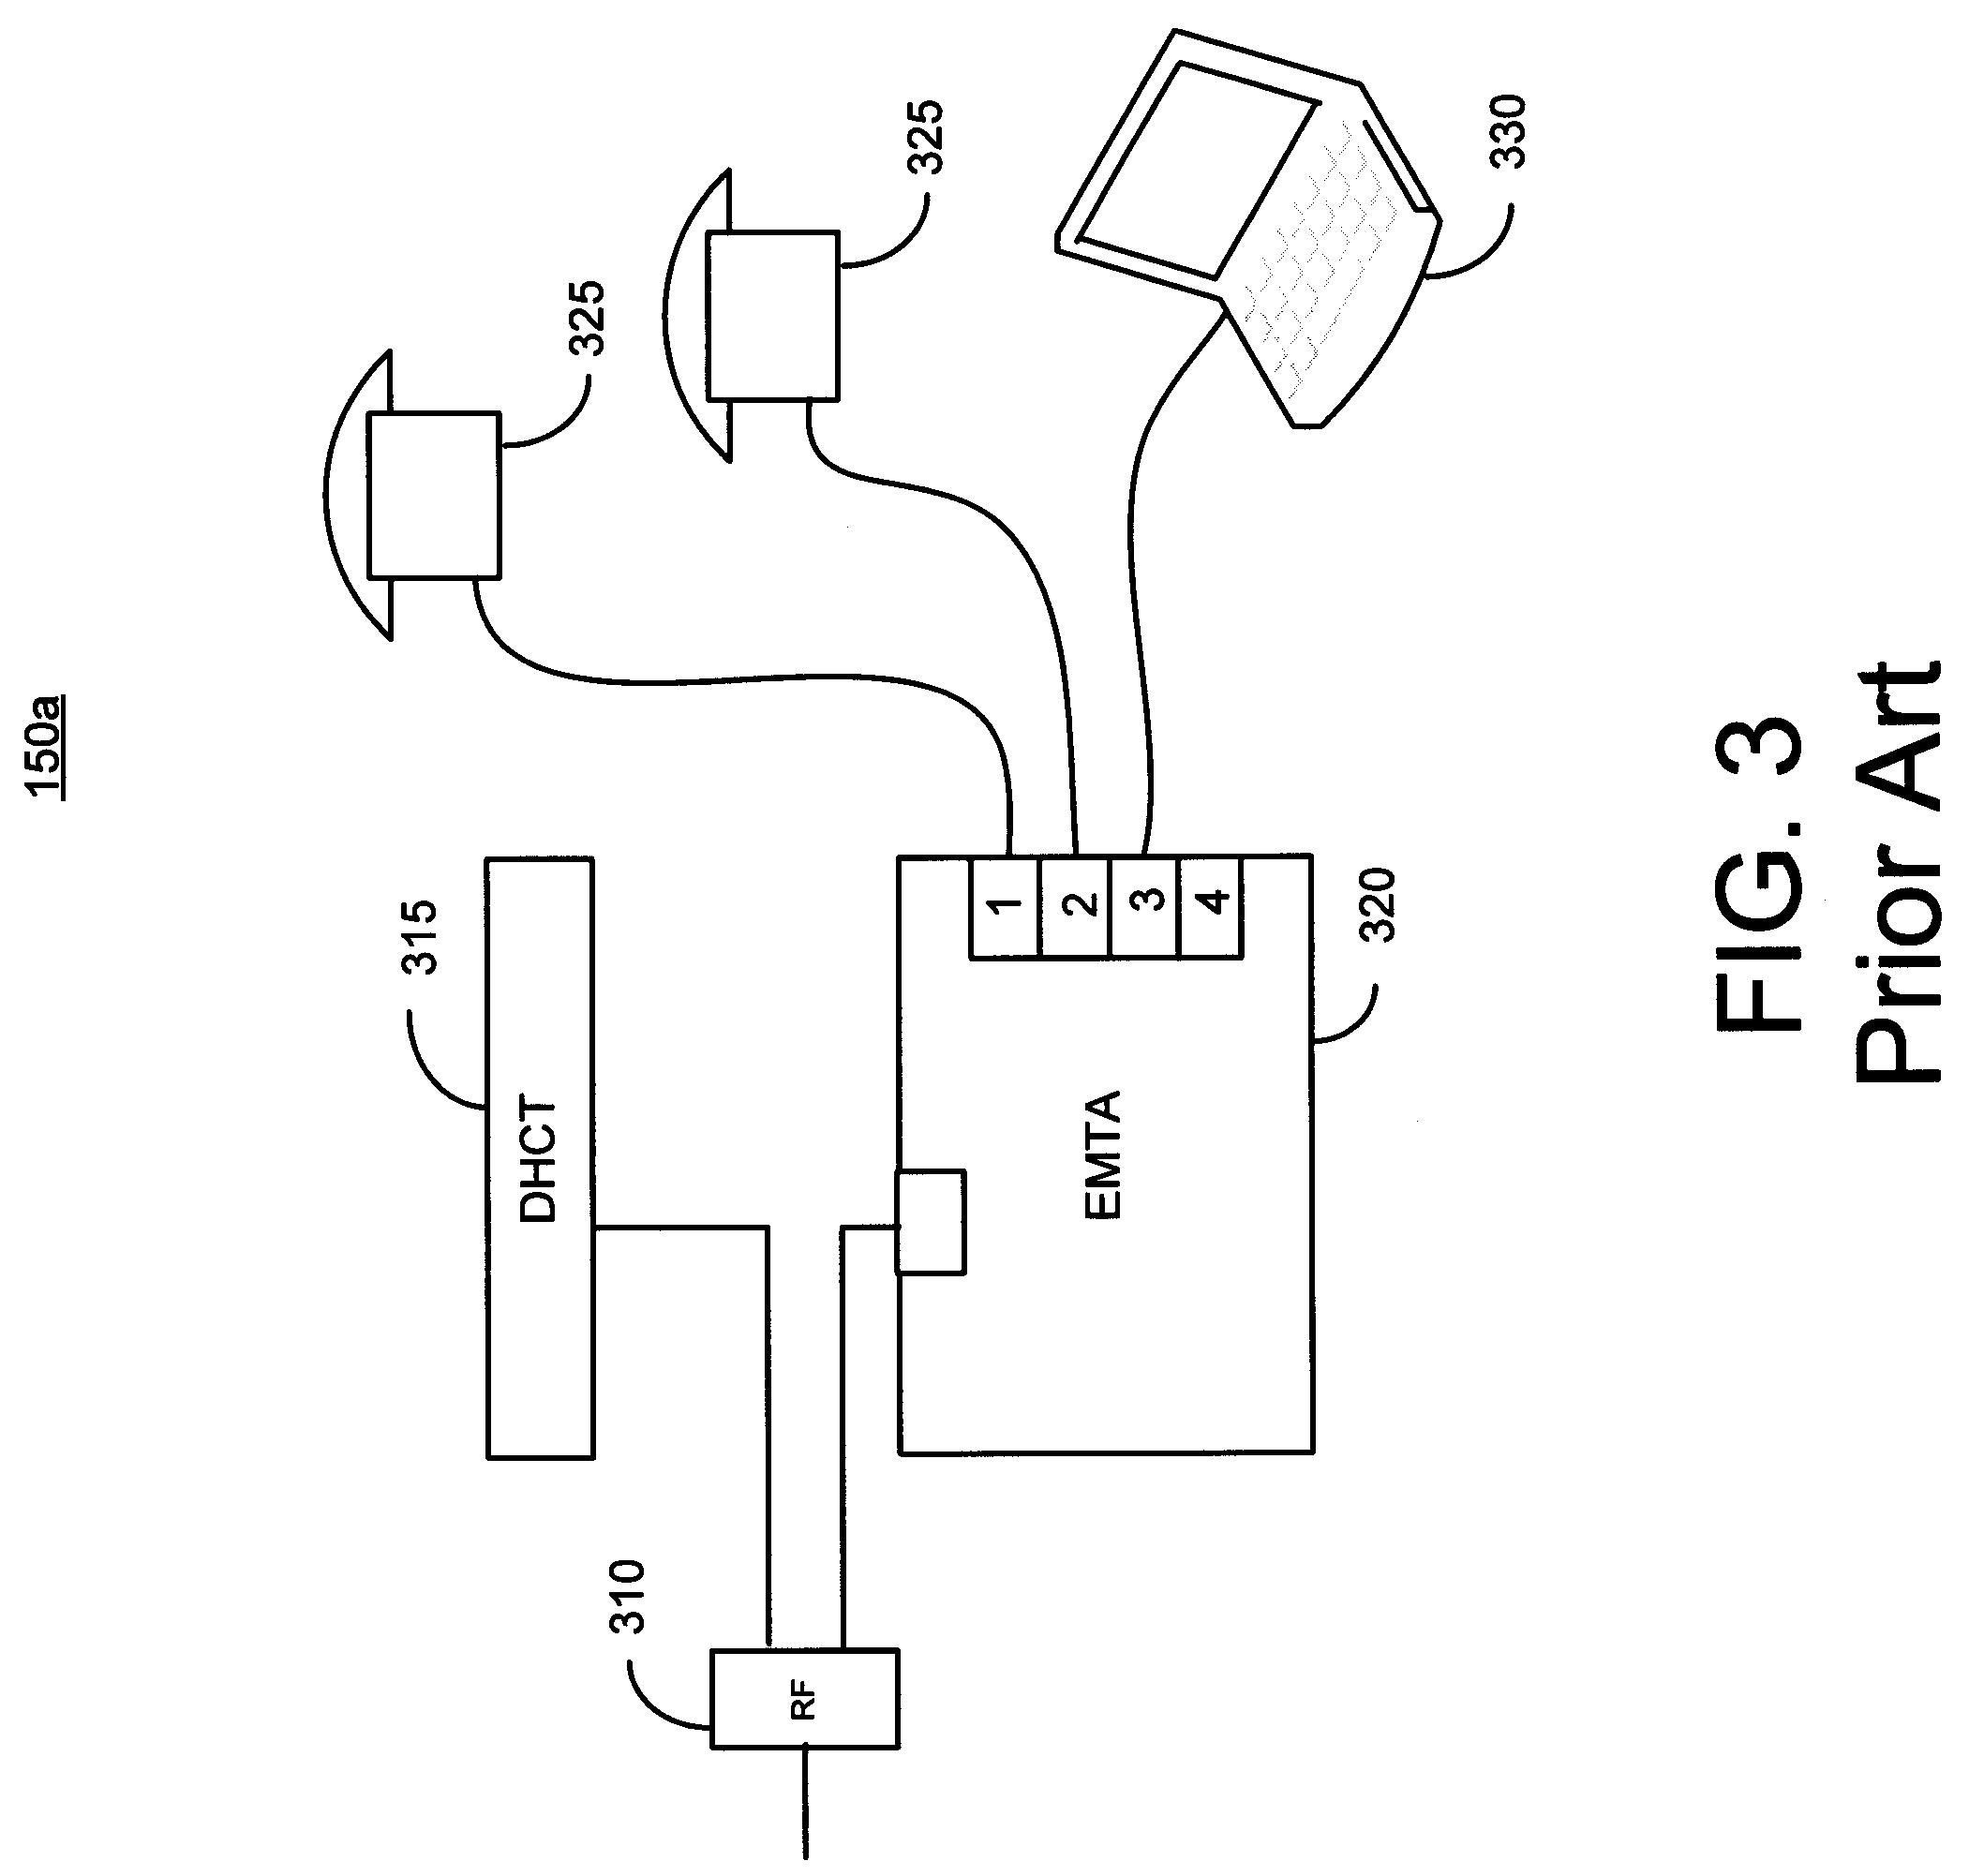 Rj31x Wiring Diagram Cable Modem